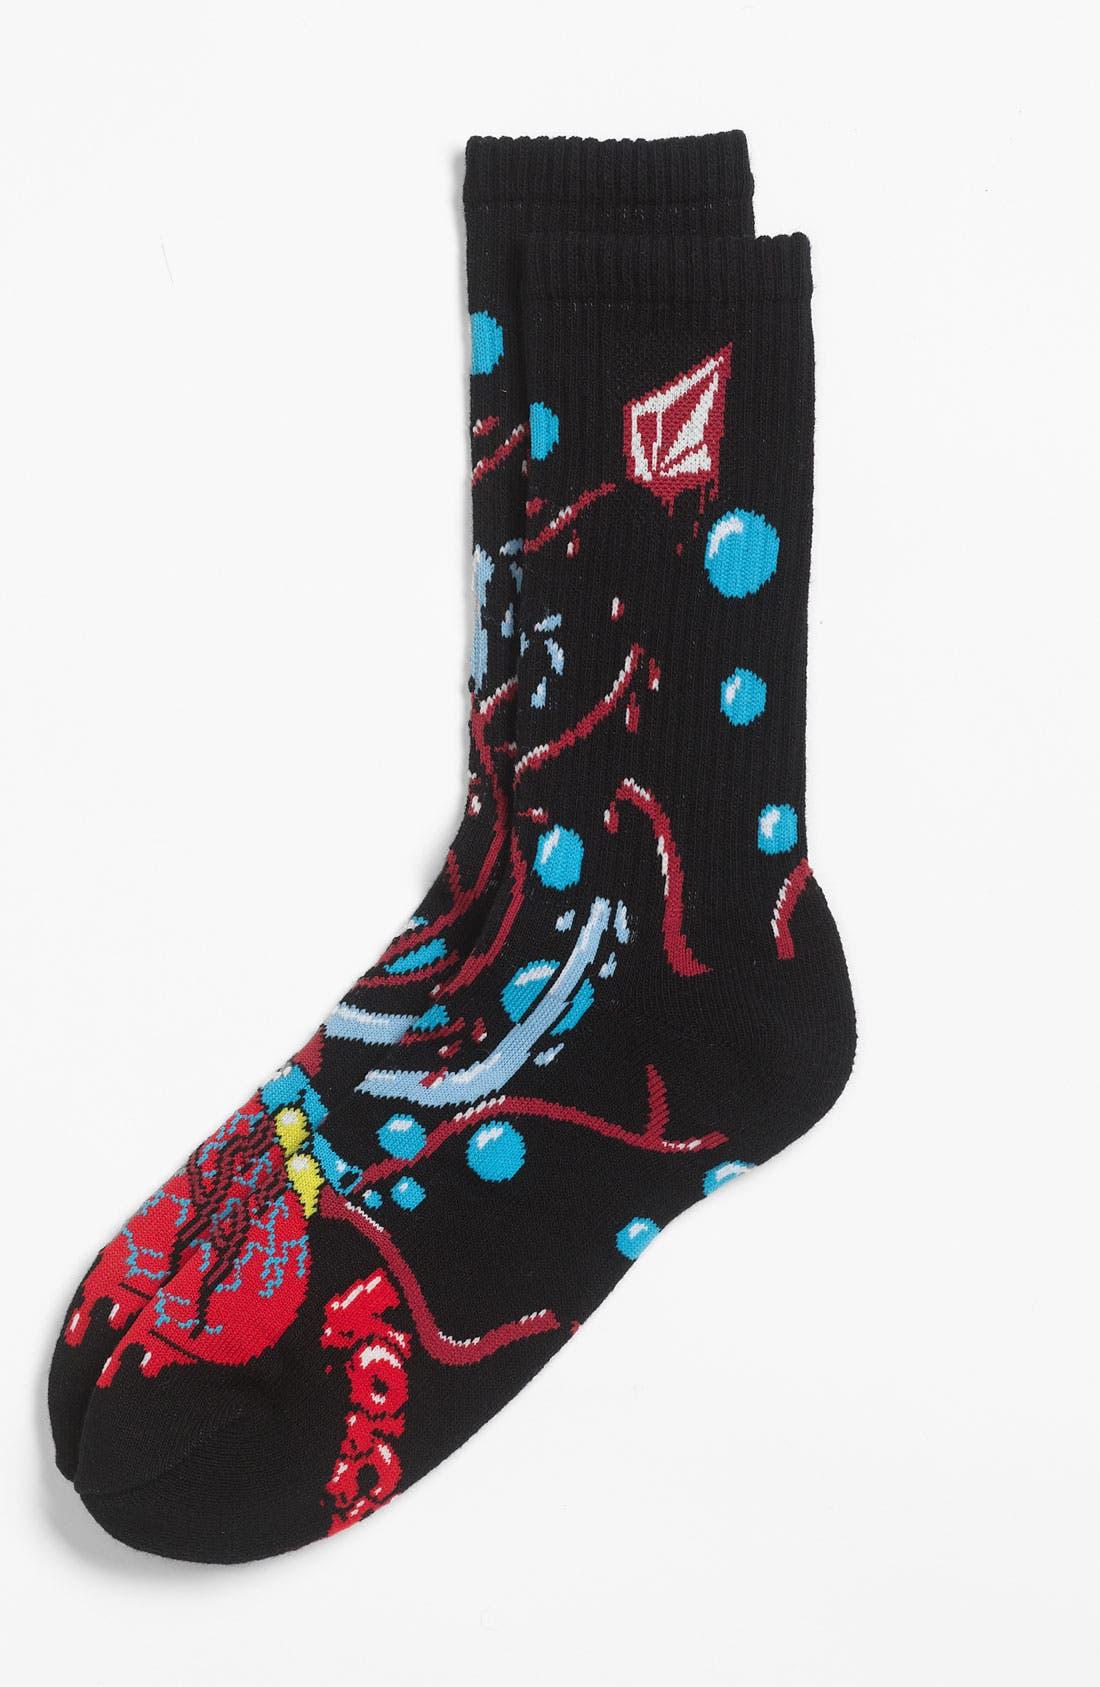 Alternate Image 1 Selected - Volcom 'Puppet' Socks (Big Boys)